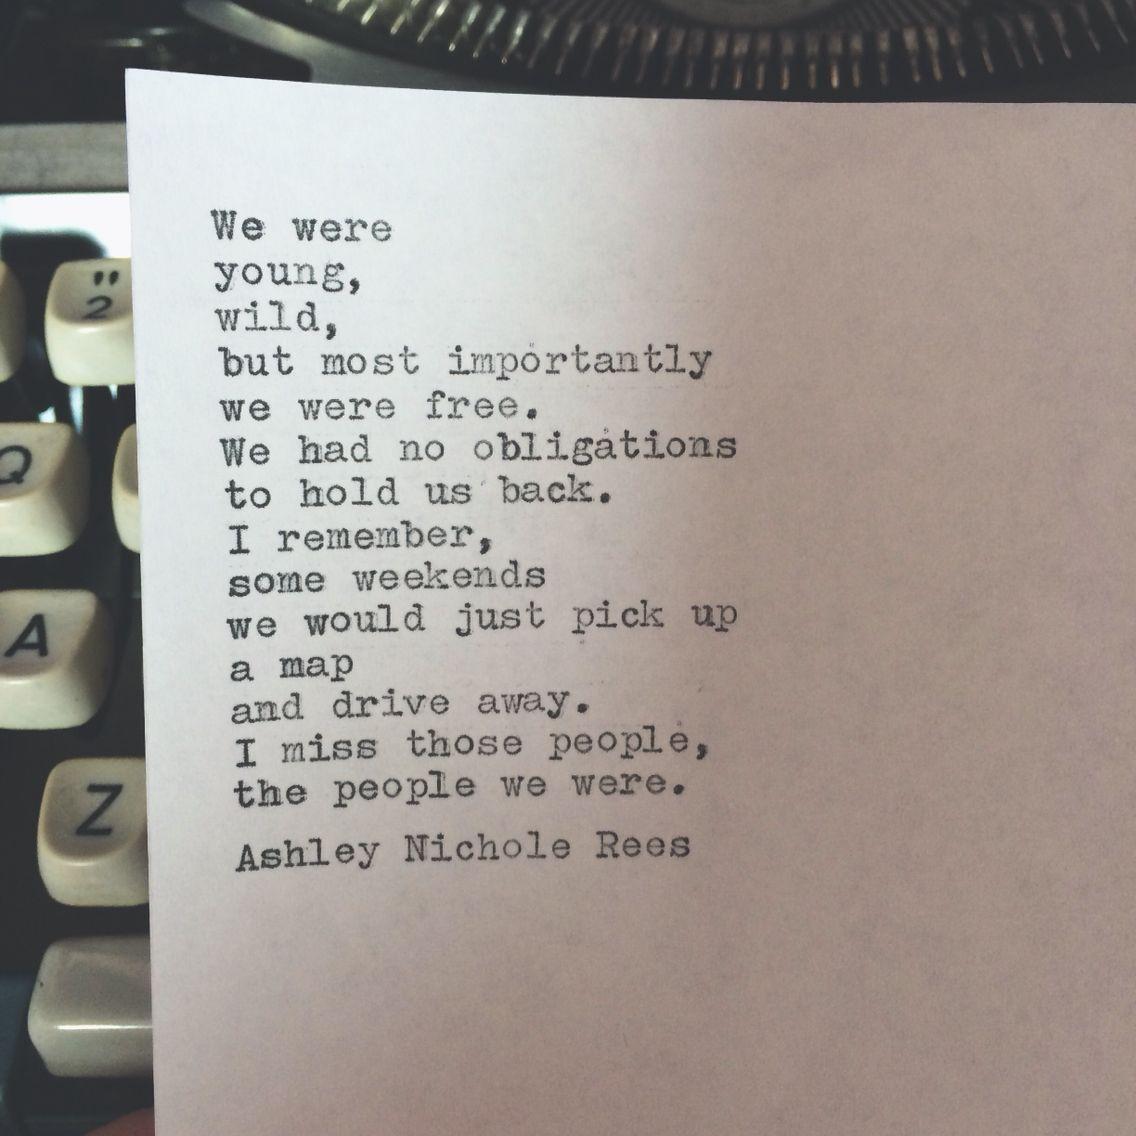 #poem #poet #prose #poetry #poetrycommunity #poetsofig #writer #writing #wordporn #poetryporn #poetryquotes #instaquote #spilledink #typewriter #typewriterpoetry #poetryisnotdead #poemsofinstagram #beautiful #emotion #poetryporn #writersofig #anr #thoughts #thinking #originalpoetry